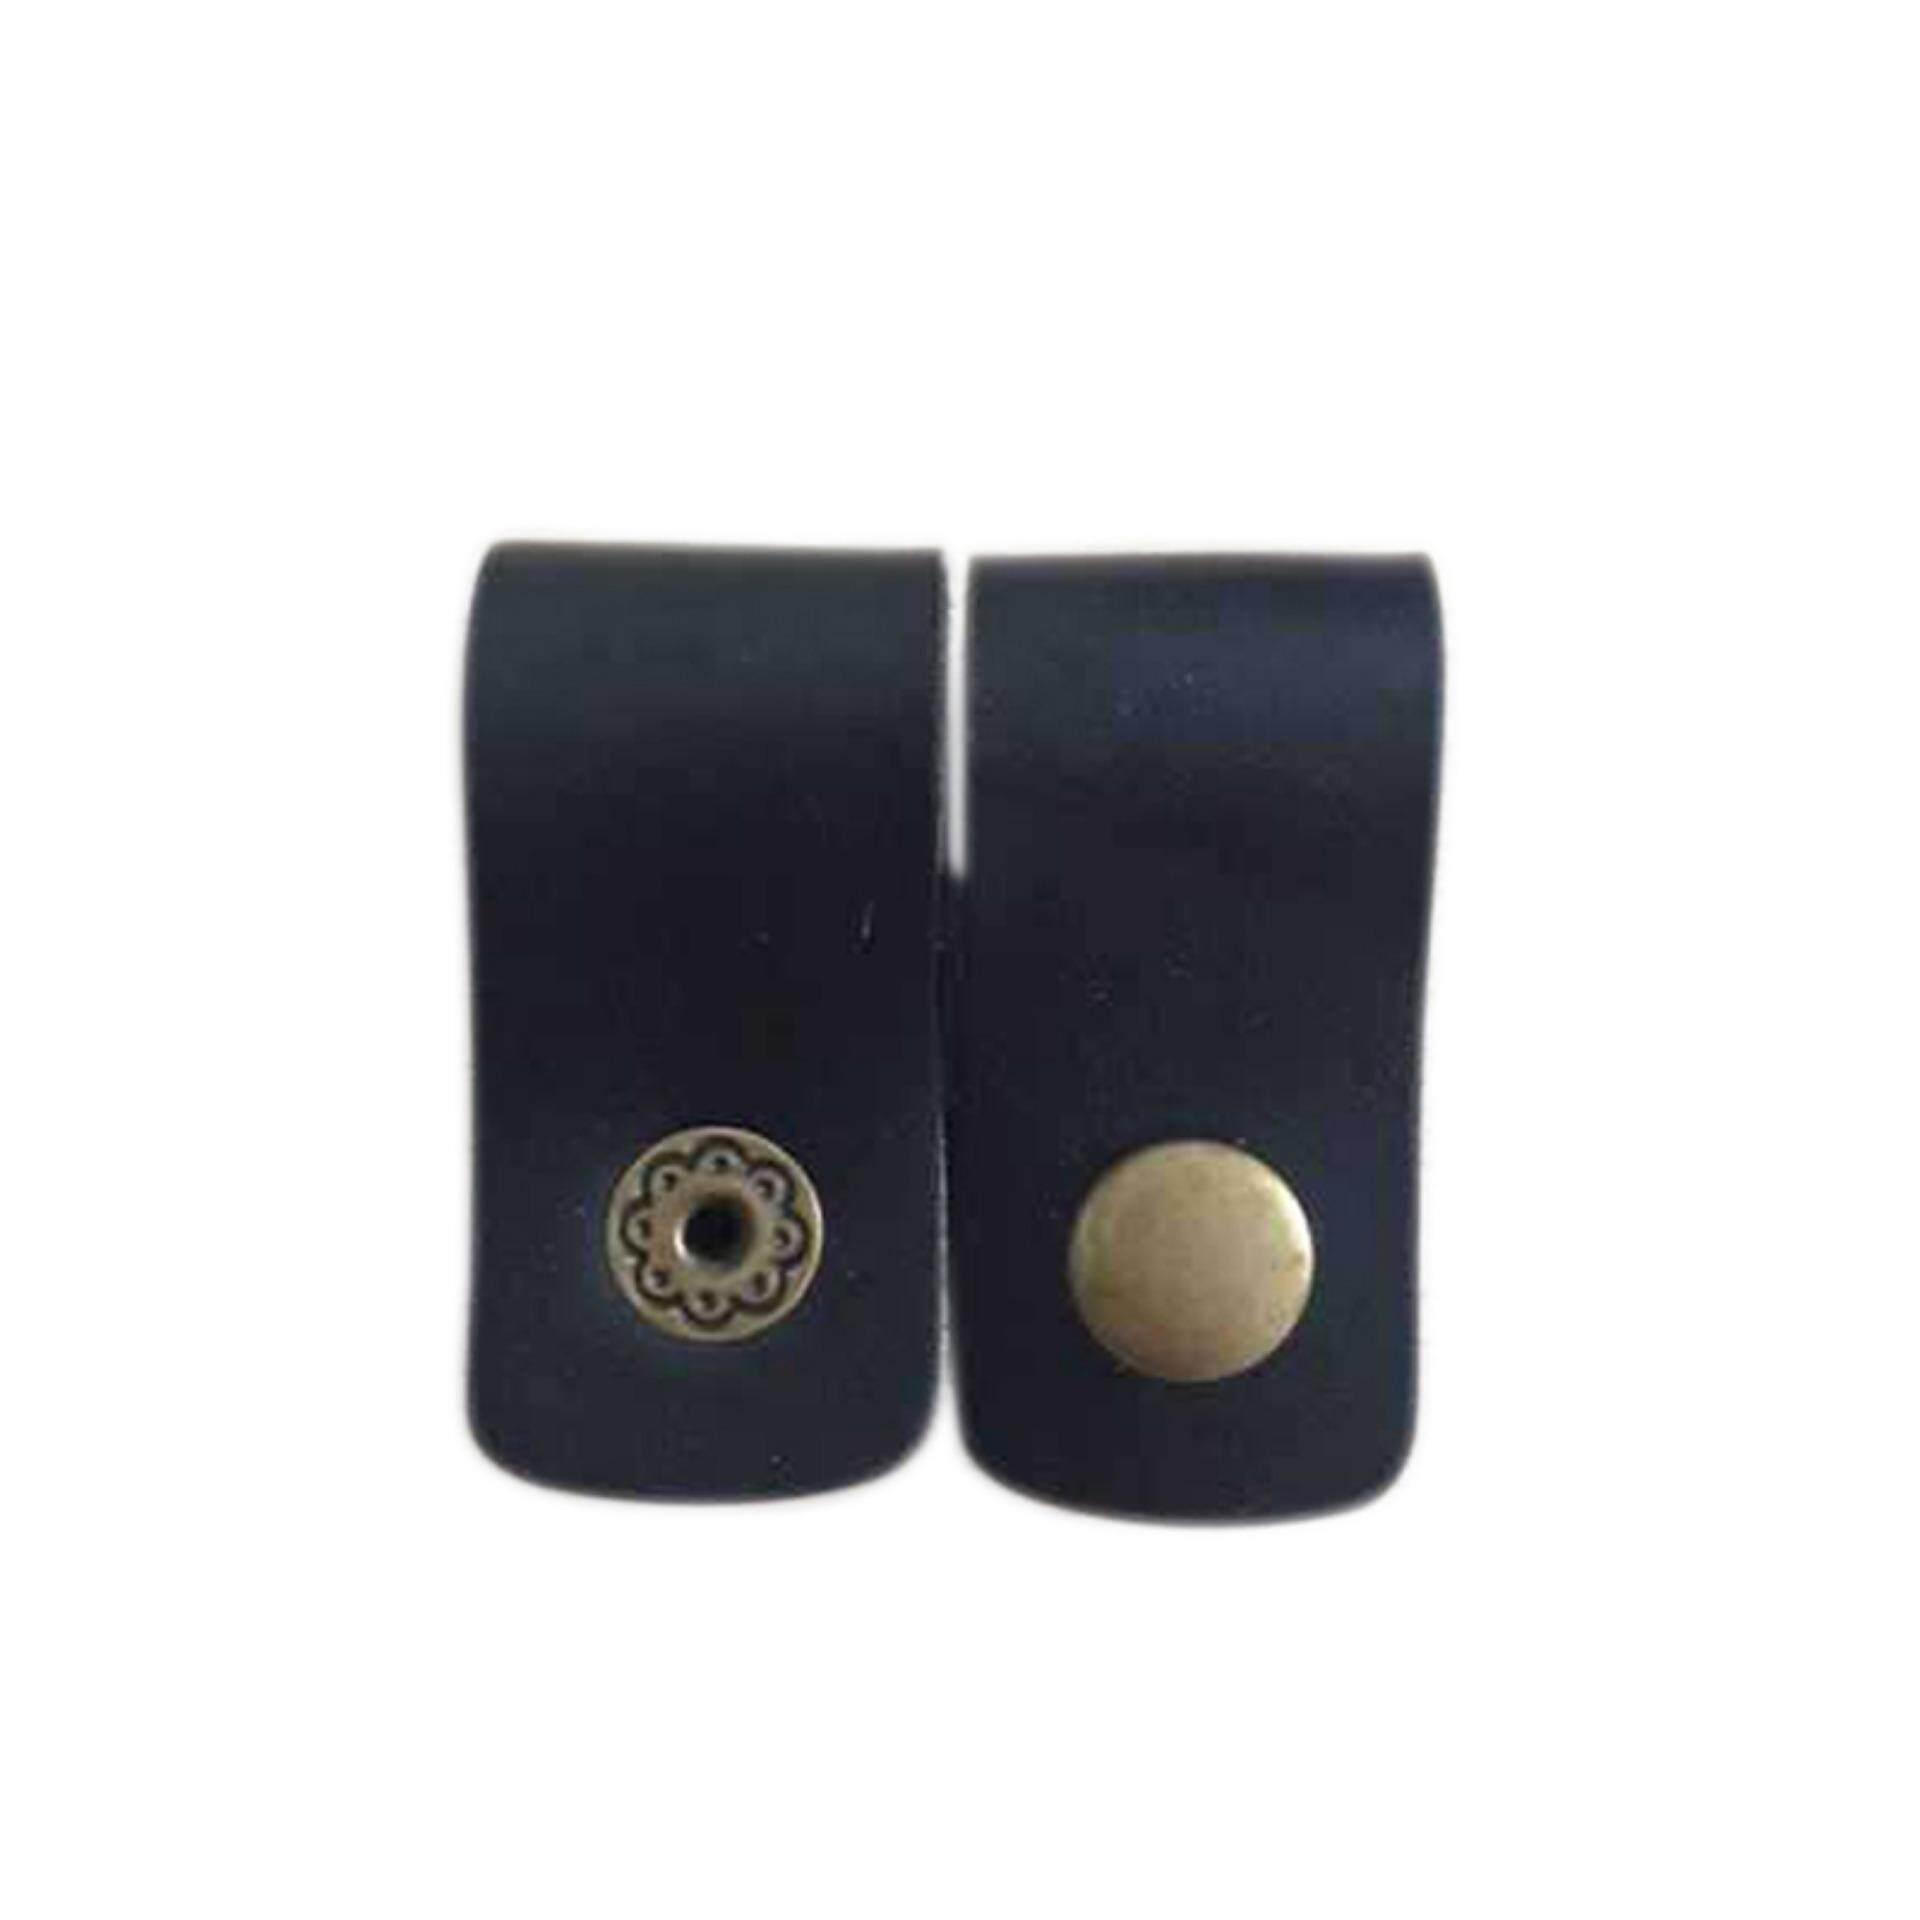 2Pcs Handy Leather Headphone Earphones Cable Tie Cord Organizer Winder Wrap hot